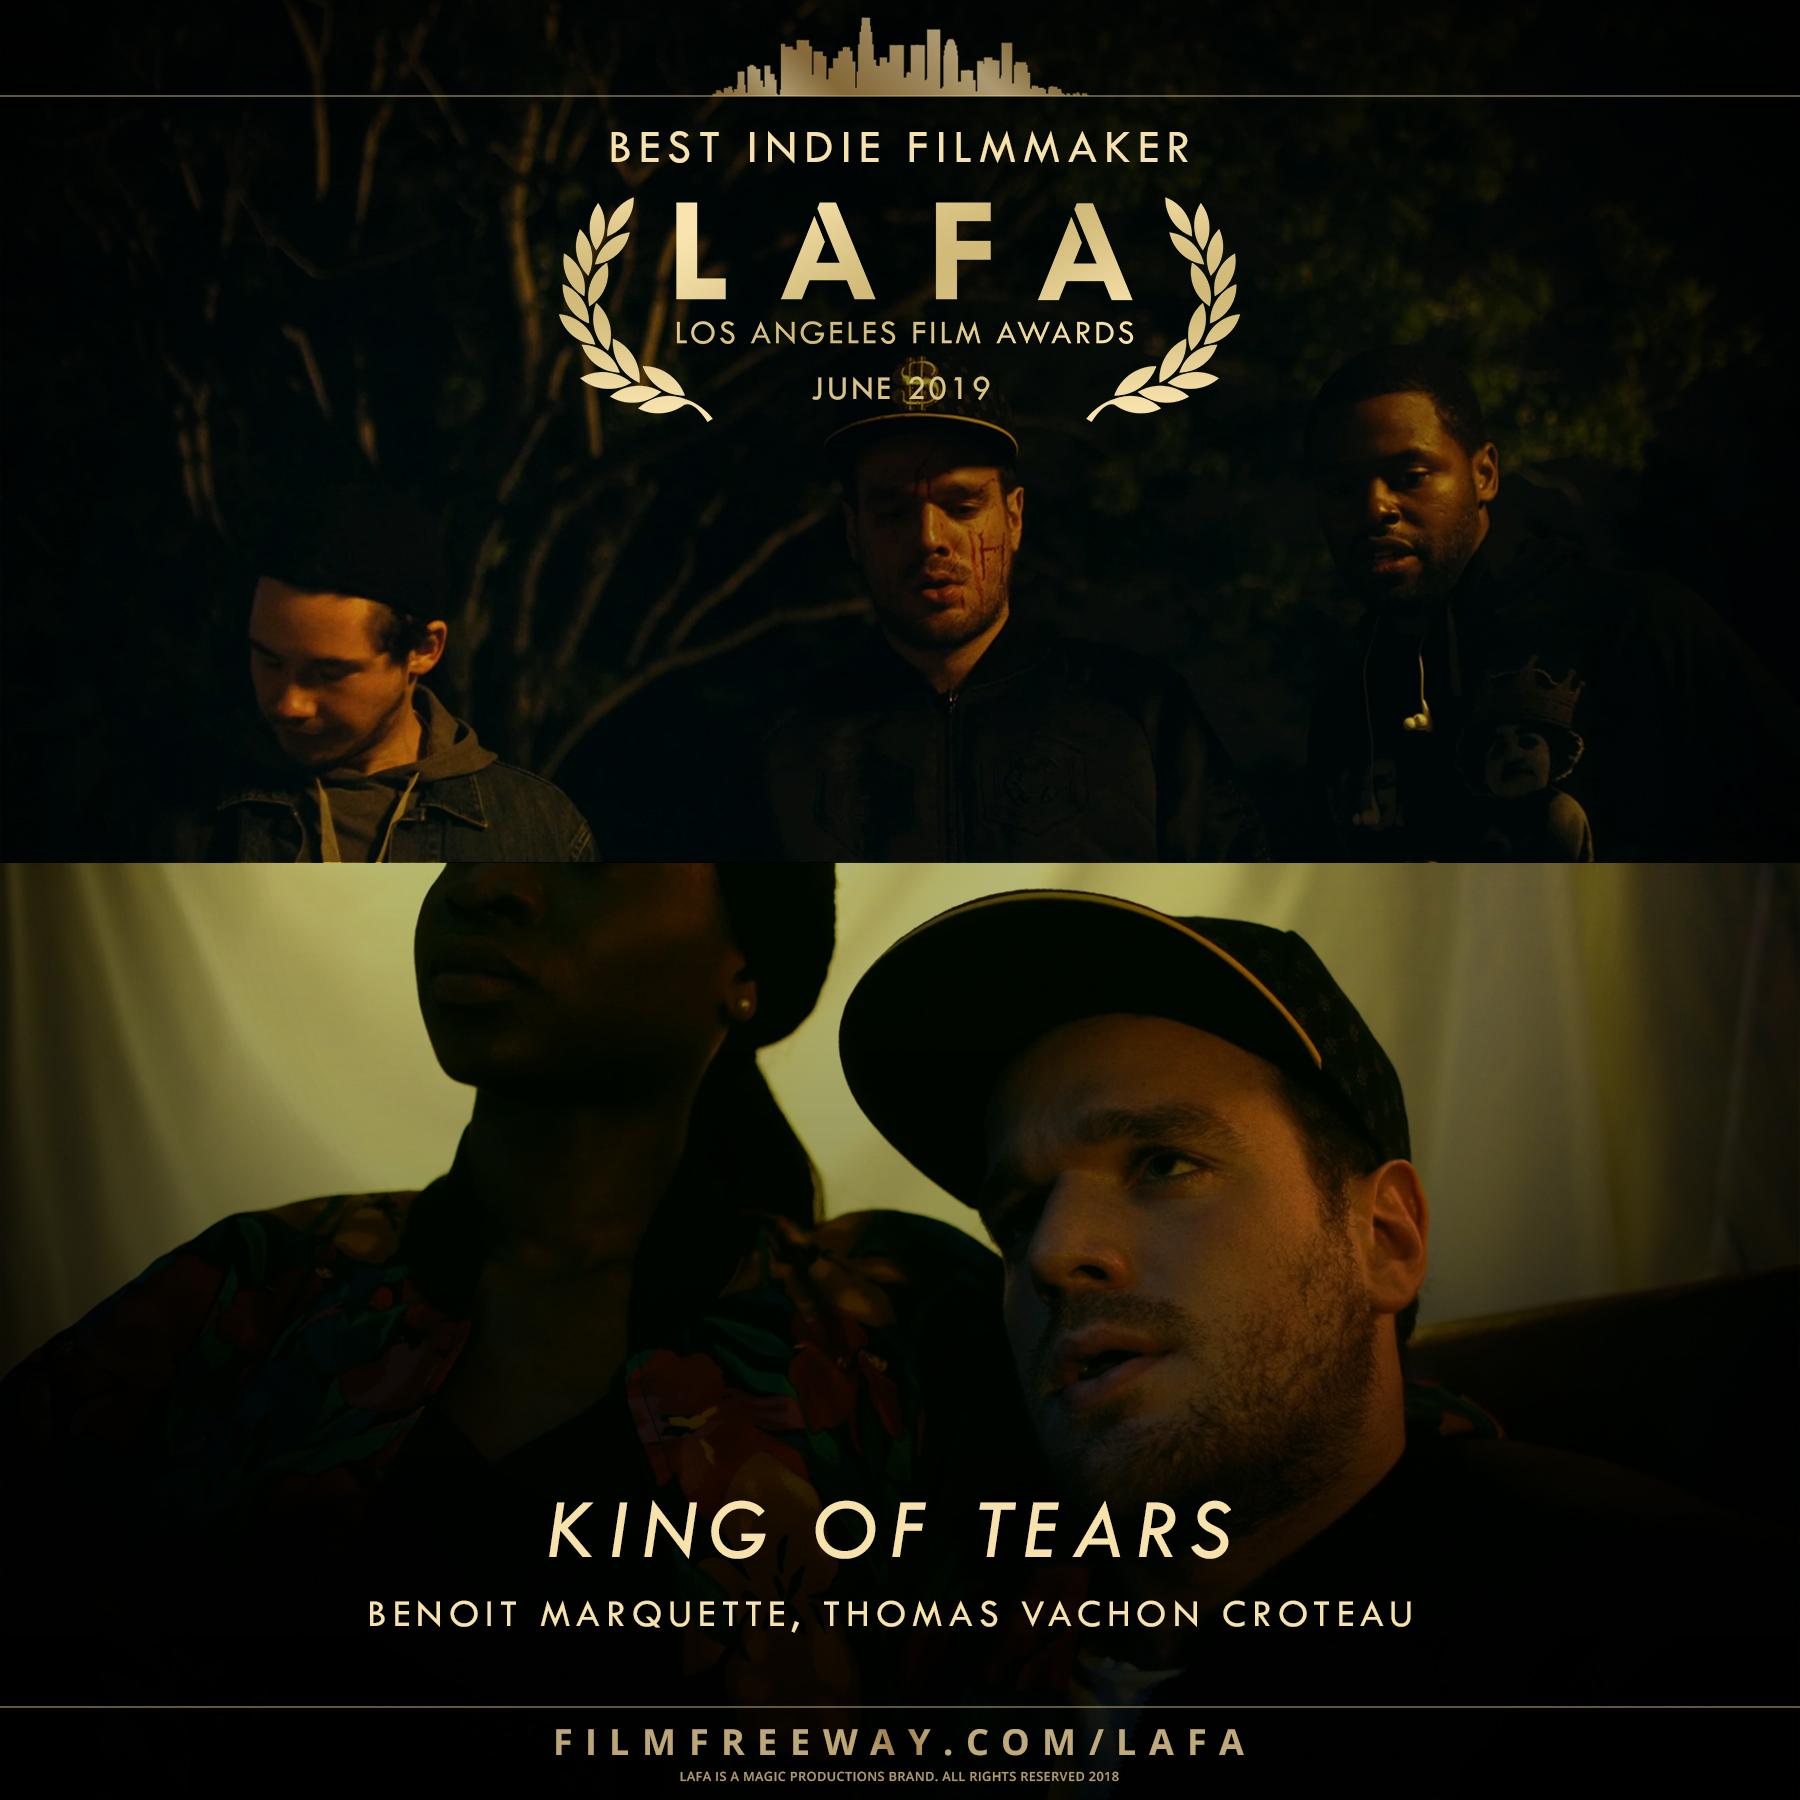 King of Tears design